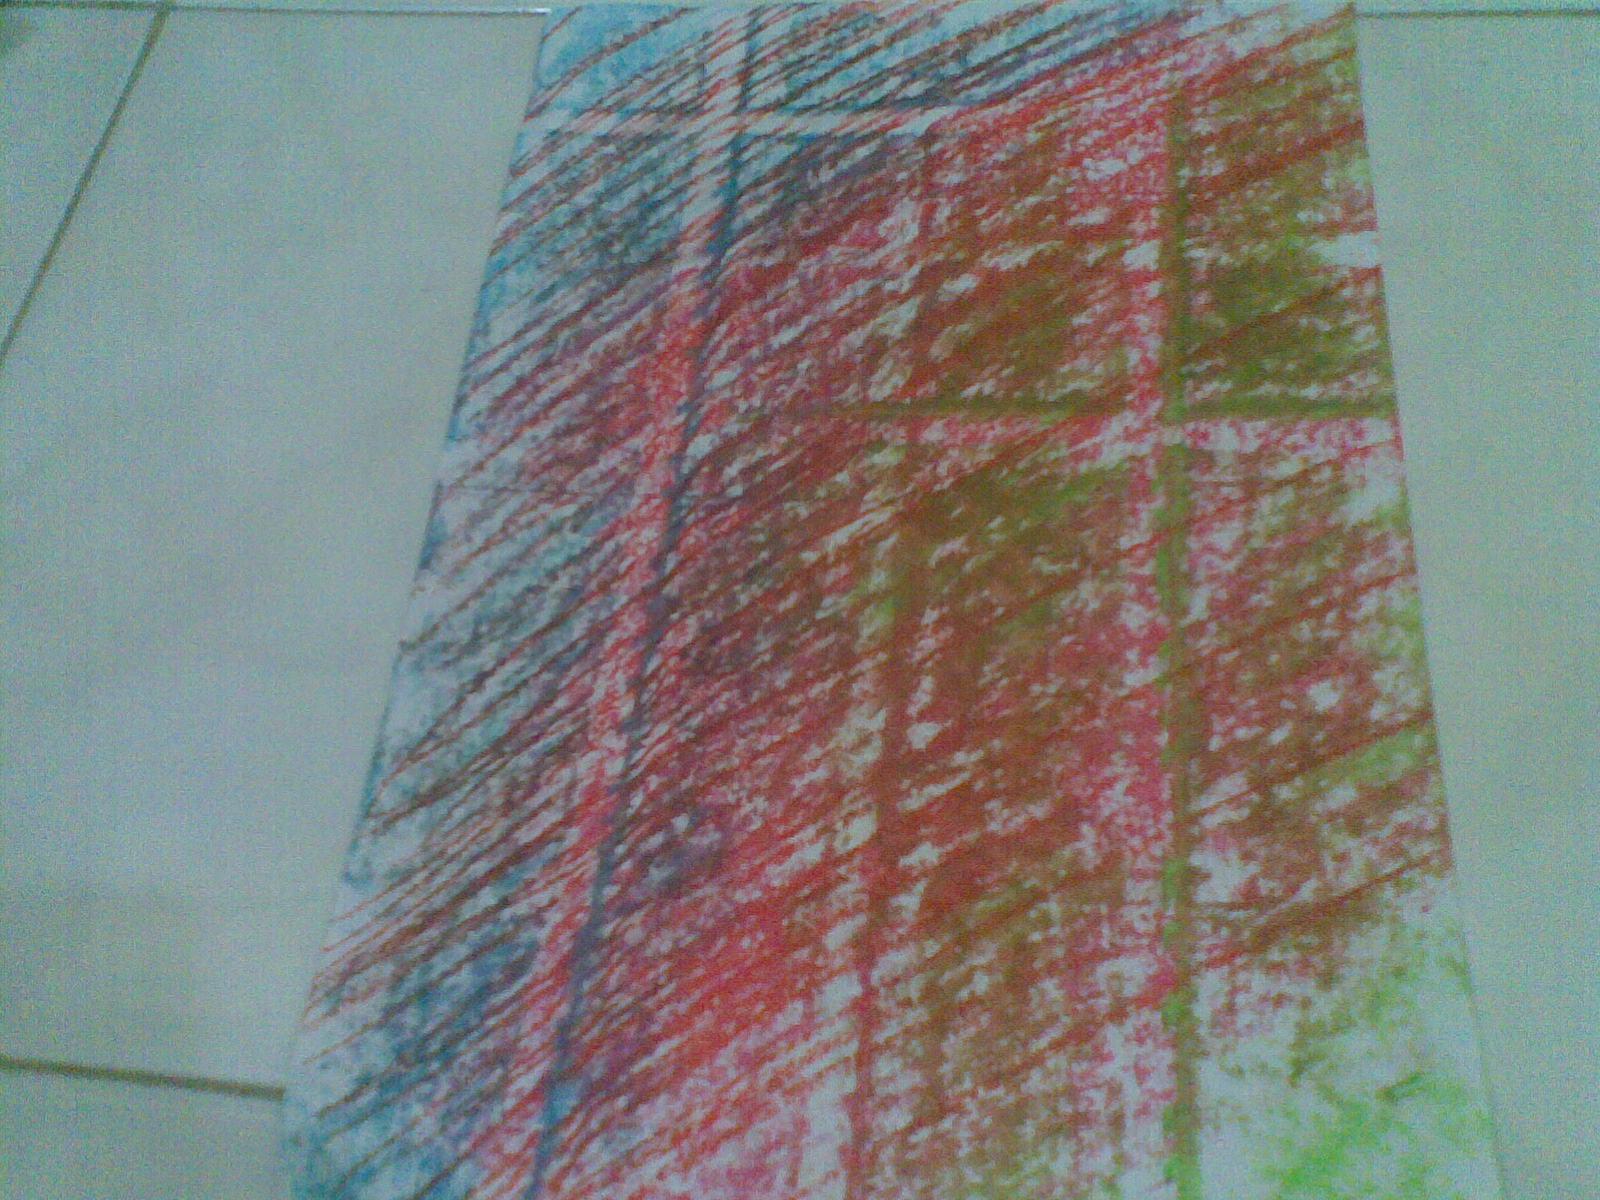 ... salib dengan menggeser kertas dan menimpa warna satu sama lain